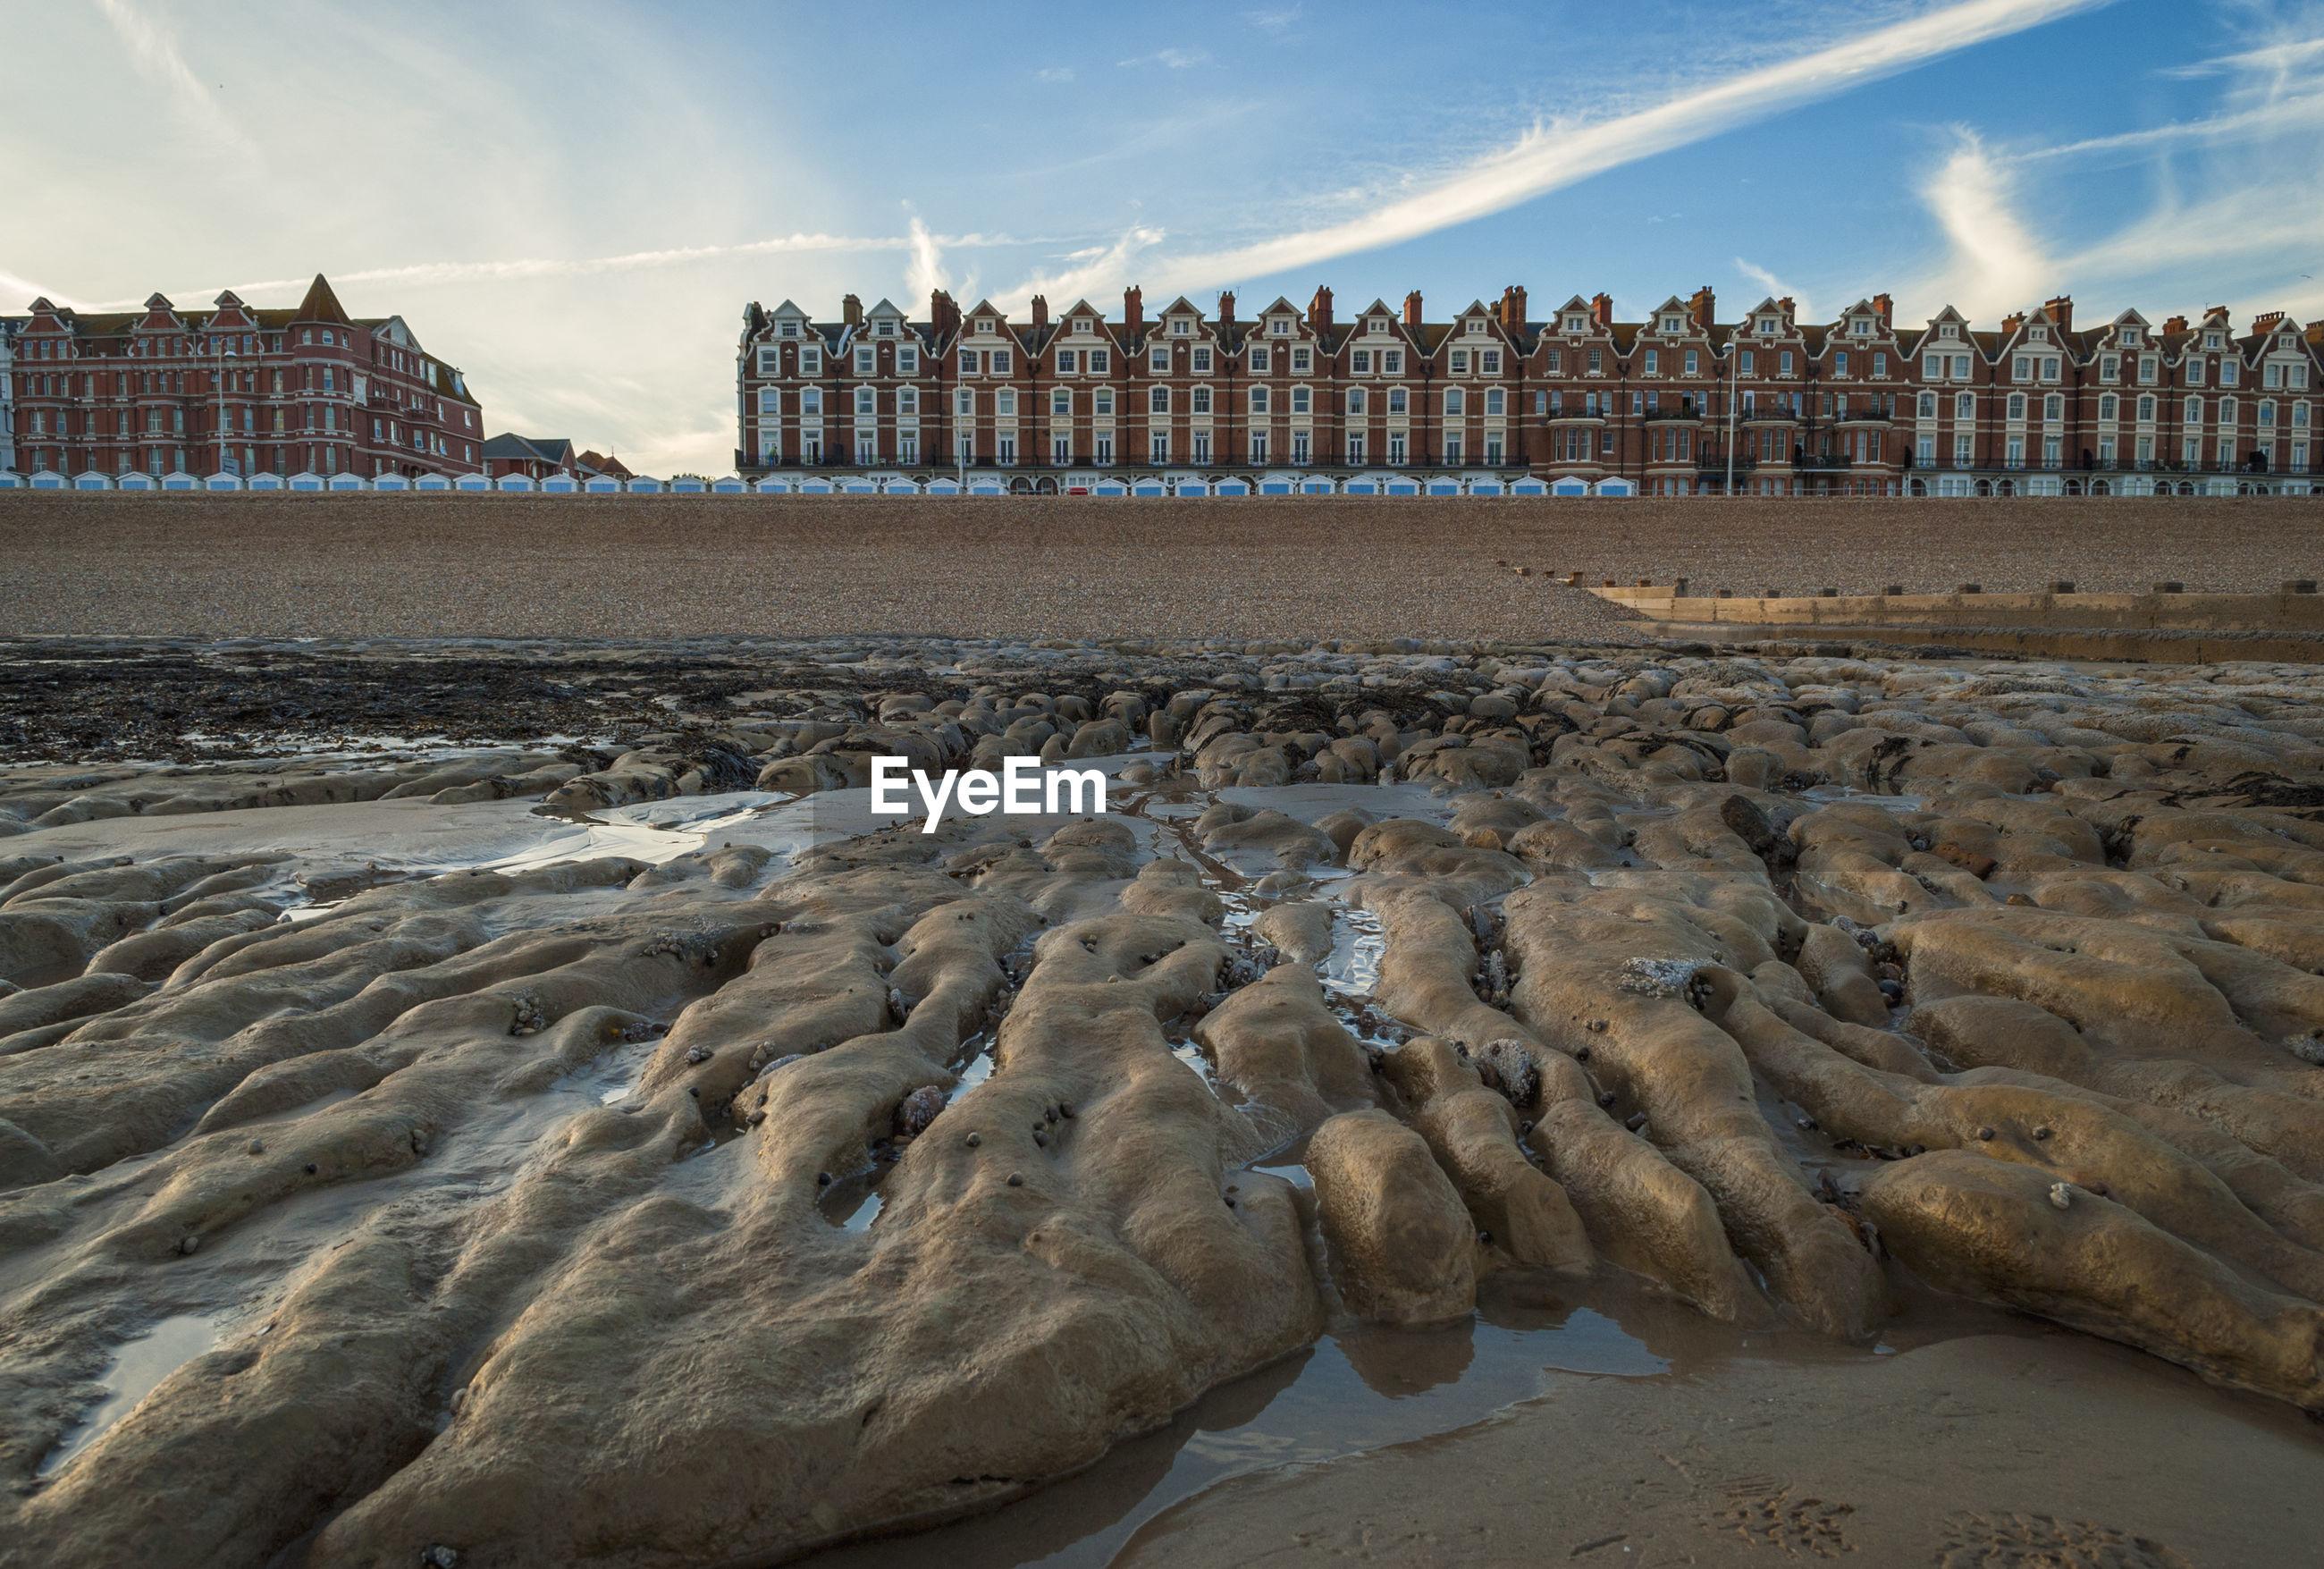 Rocks at shore against buildings in city